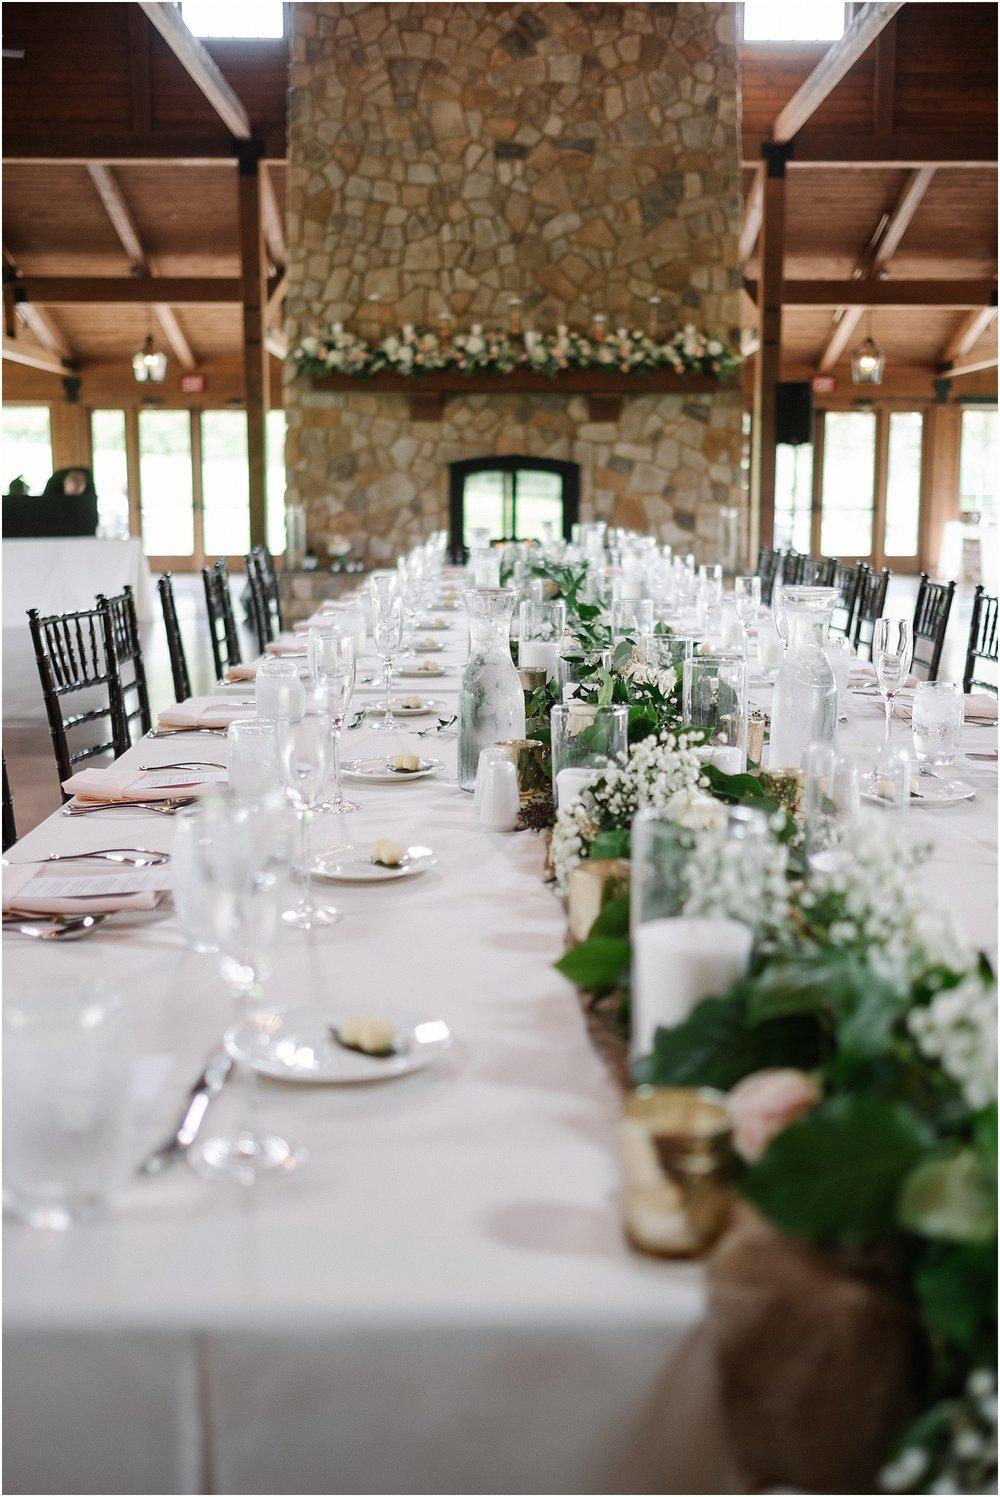 S_A_Chicago_Area_Rockford_Rustic_Joyful_Vibrant_Wedding_0116.jpg